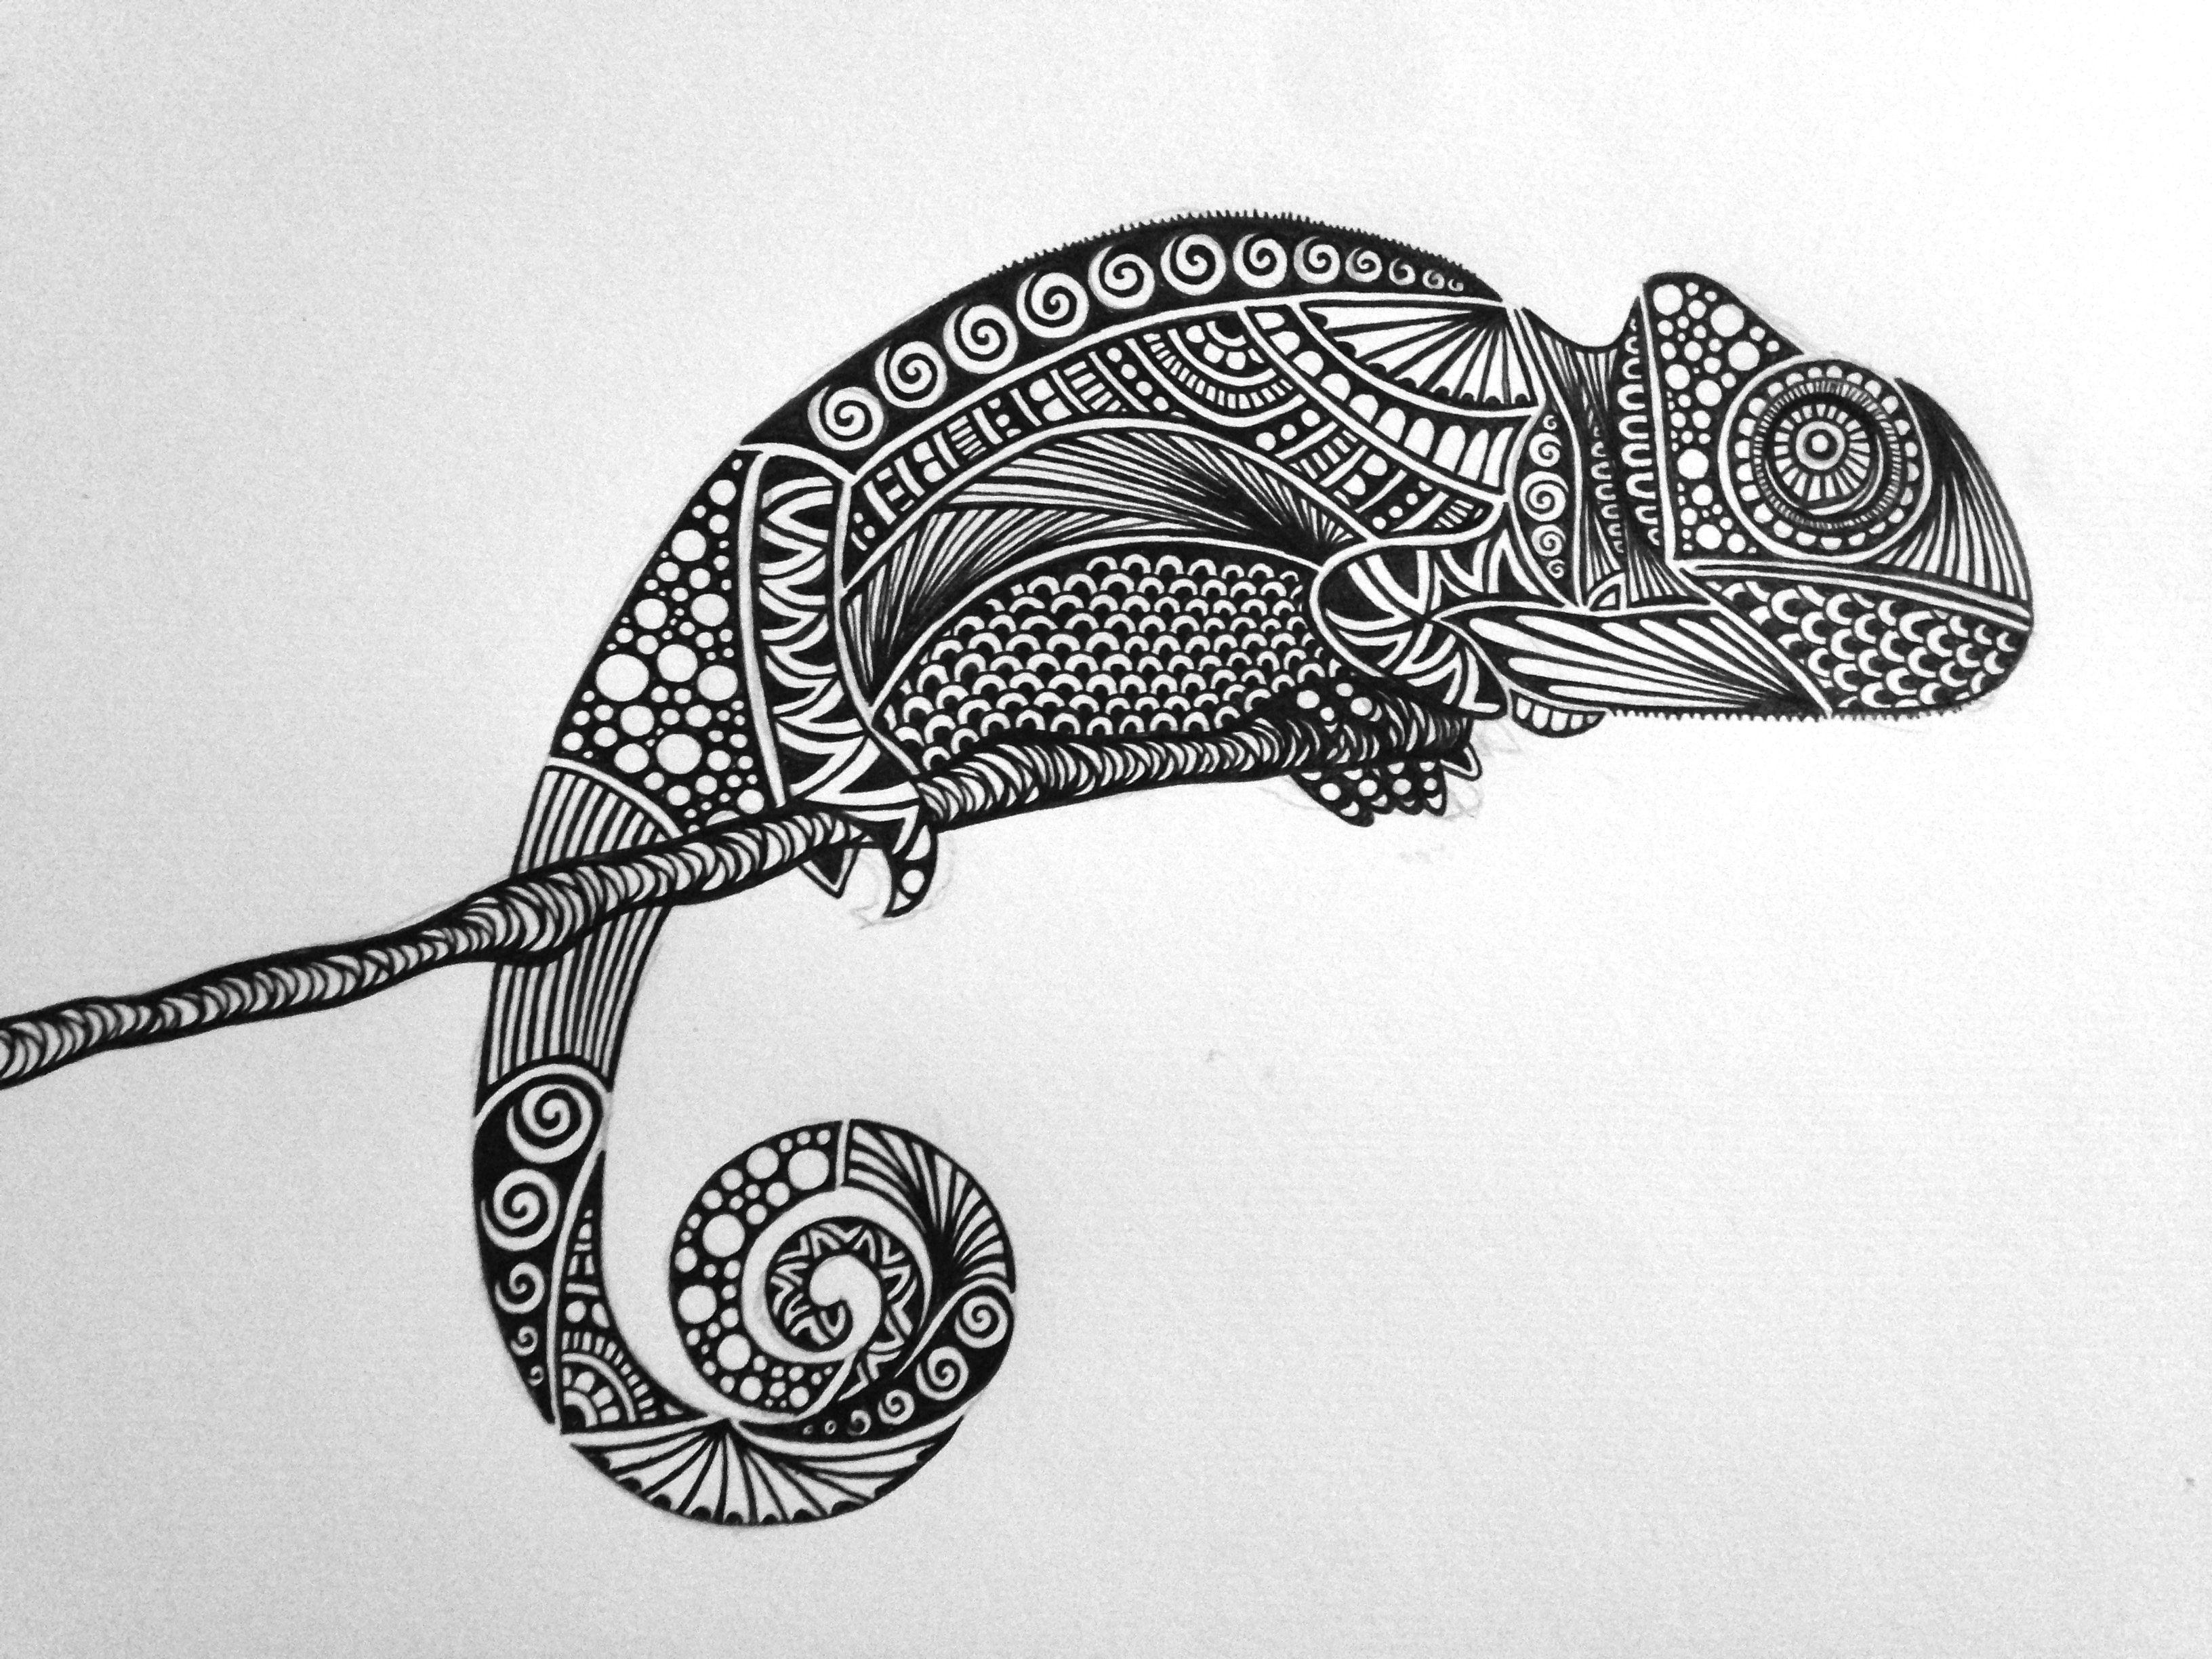 Chameleon Bnw Zentangle Zendoodle Mandala Lineart Doodleart Sharpieart Illustration Design